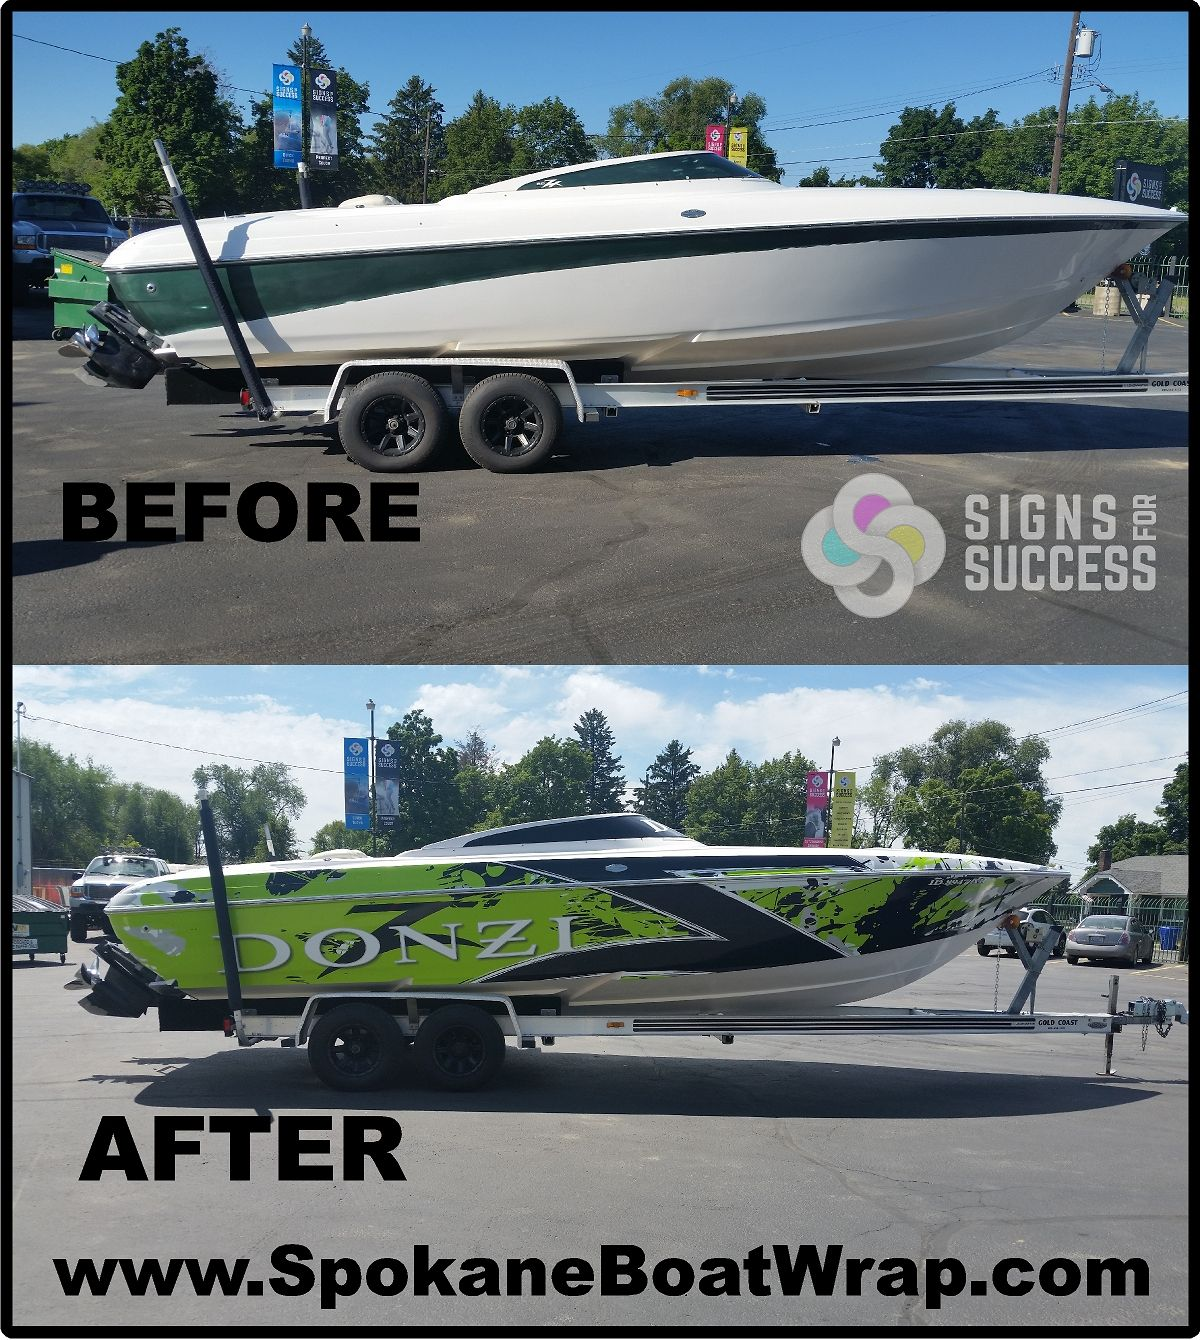 Sea Ray Custom Vinyl Wrap Boat Wraps Custom Vinyl Pinterest - Boat decalsamerican flag boat decals usa flag boat graphics xtreme digital